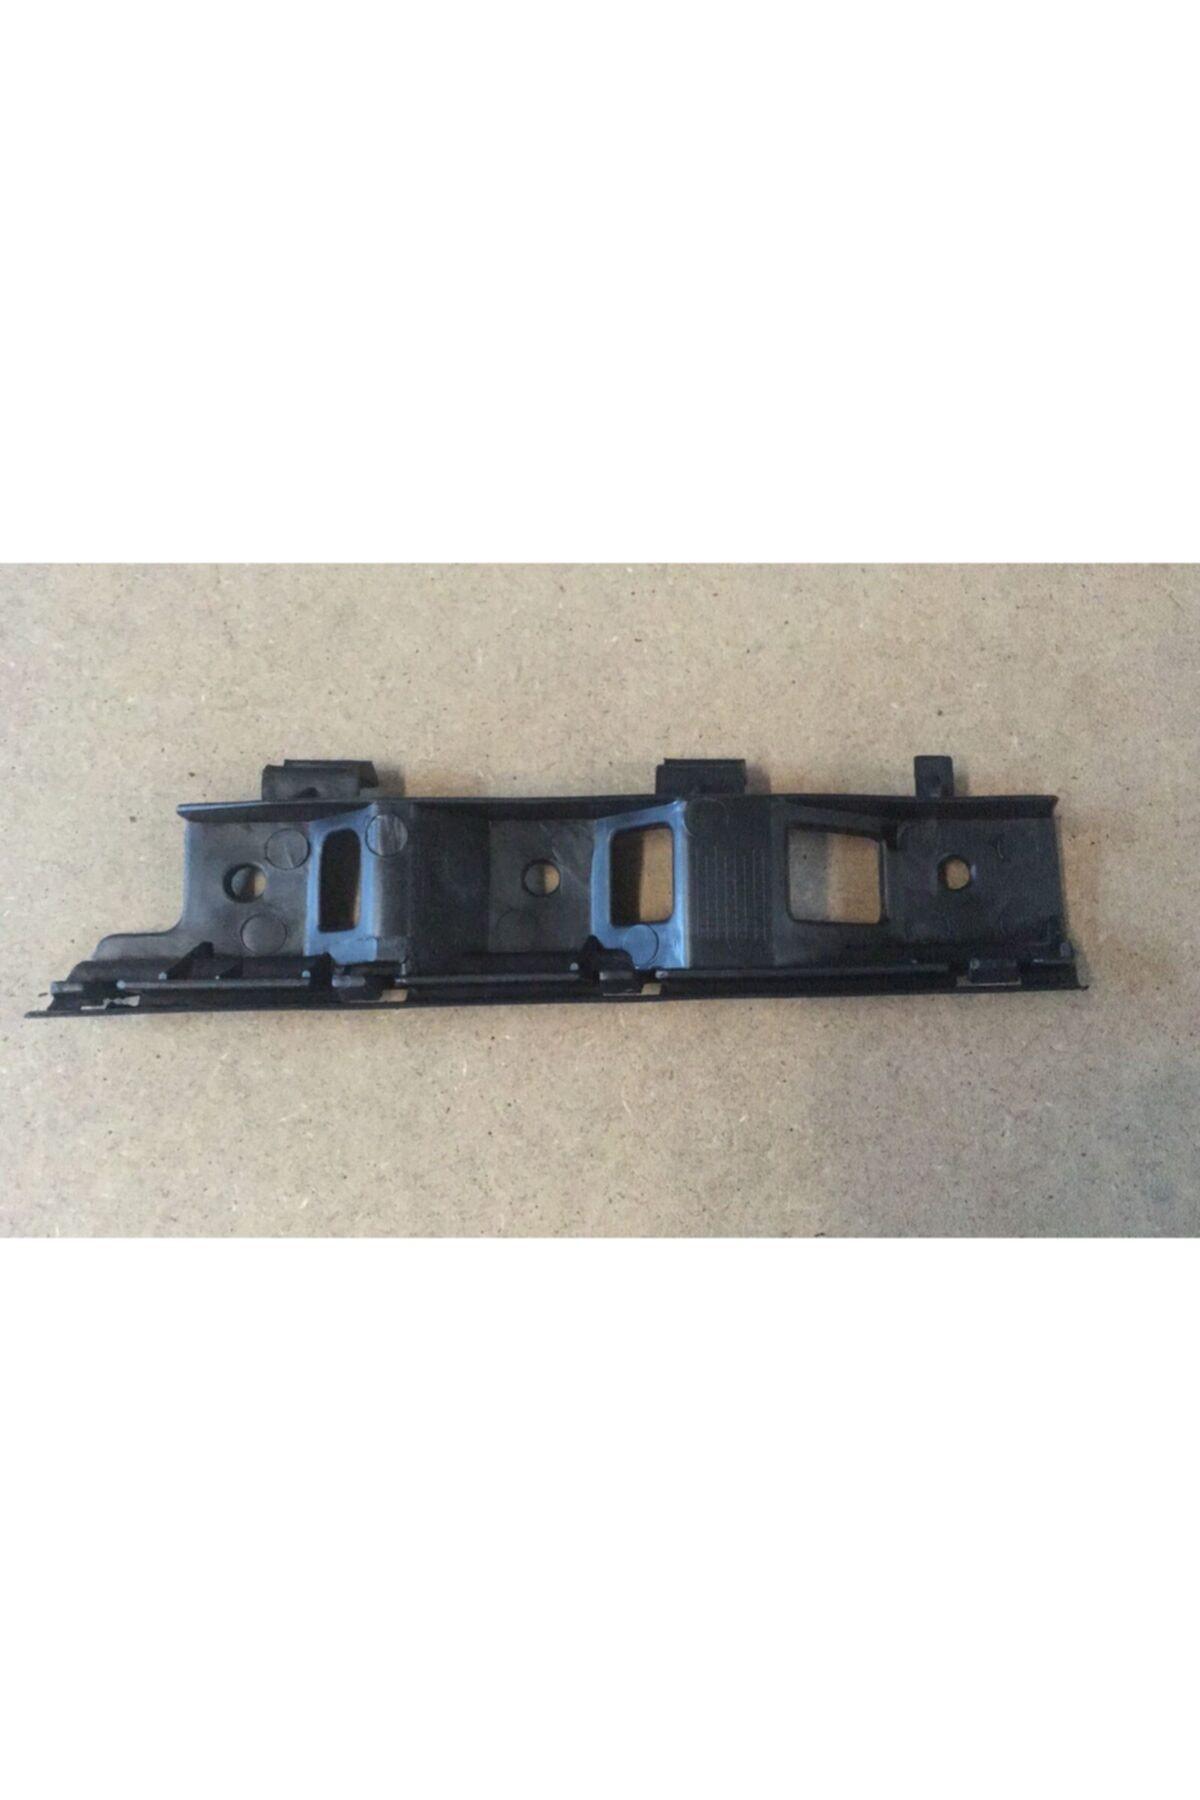 DMR Passat Tampon Braketi Ön Orta Sol 3c0807183 Bc3c0807183 Otodemır 1